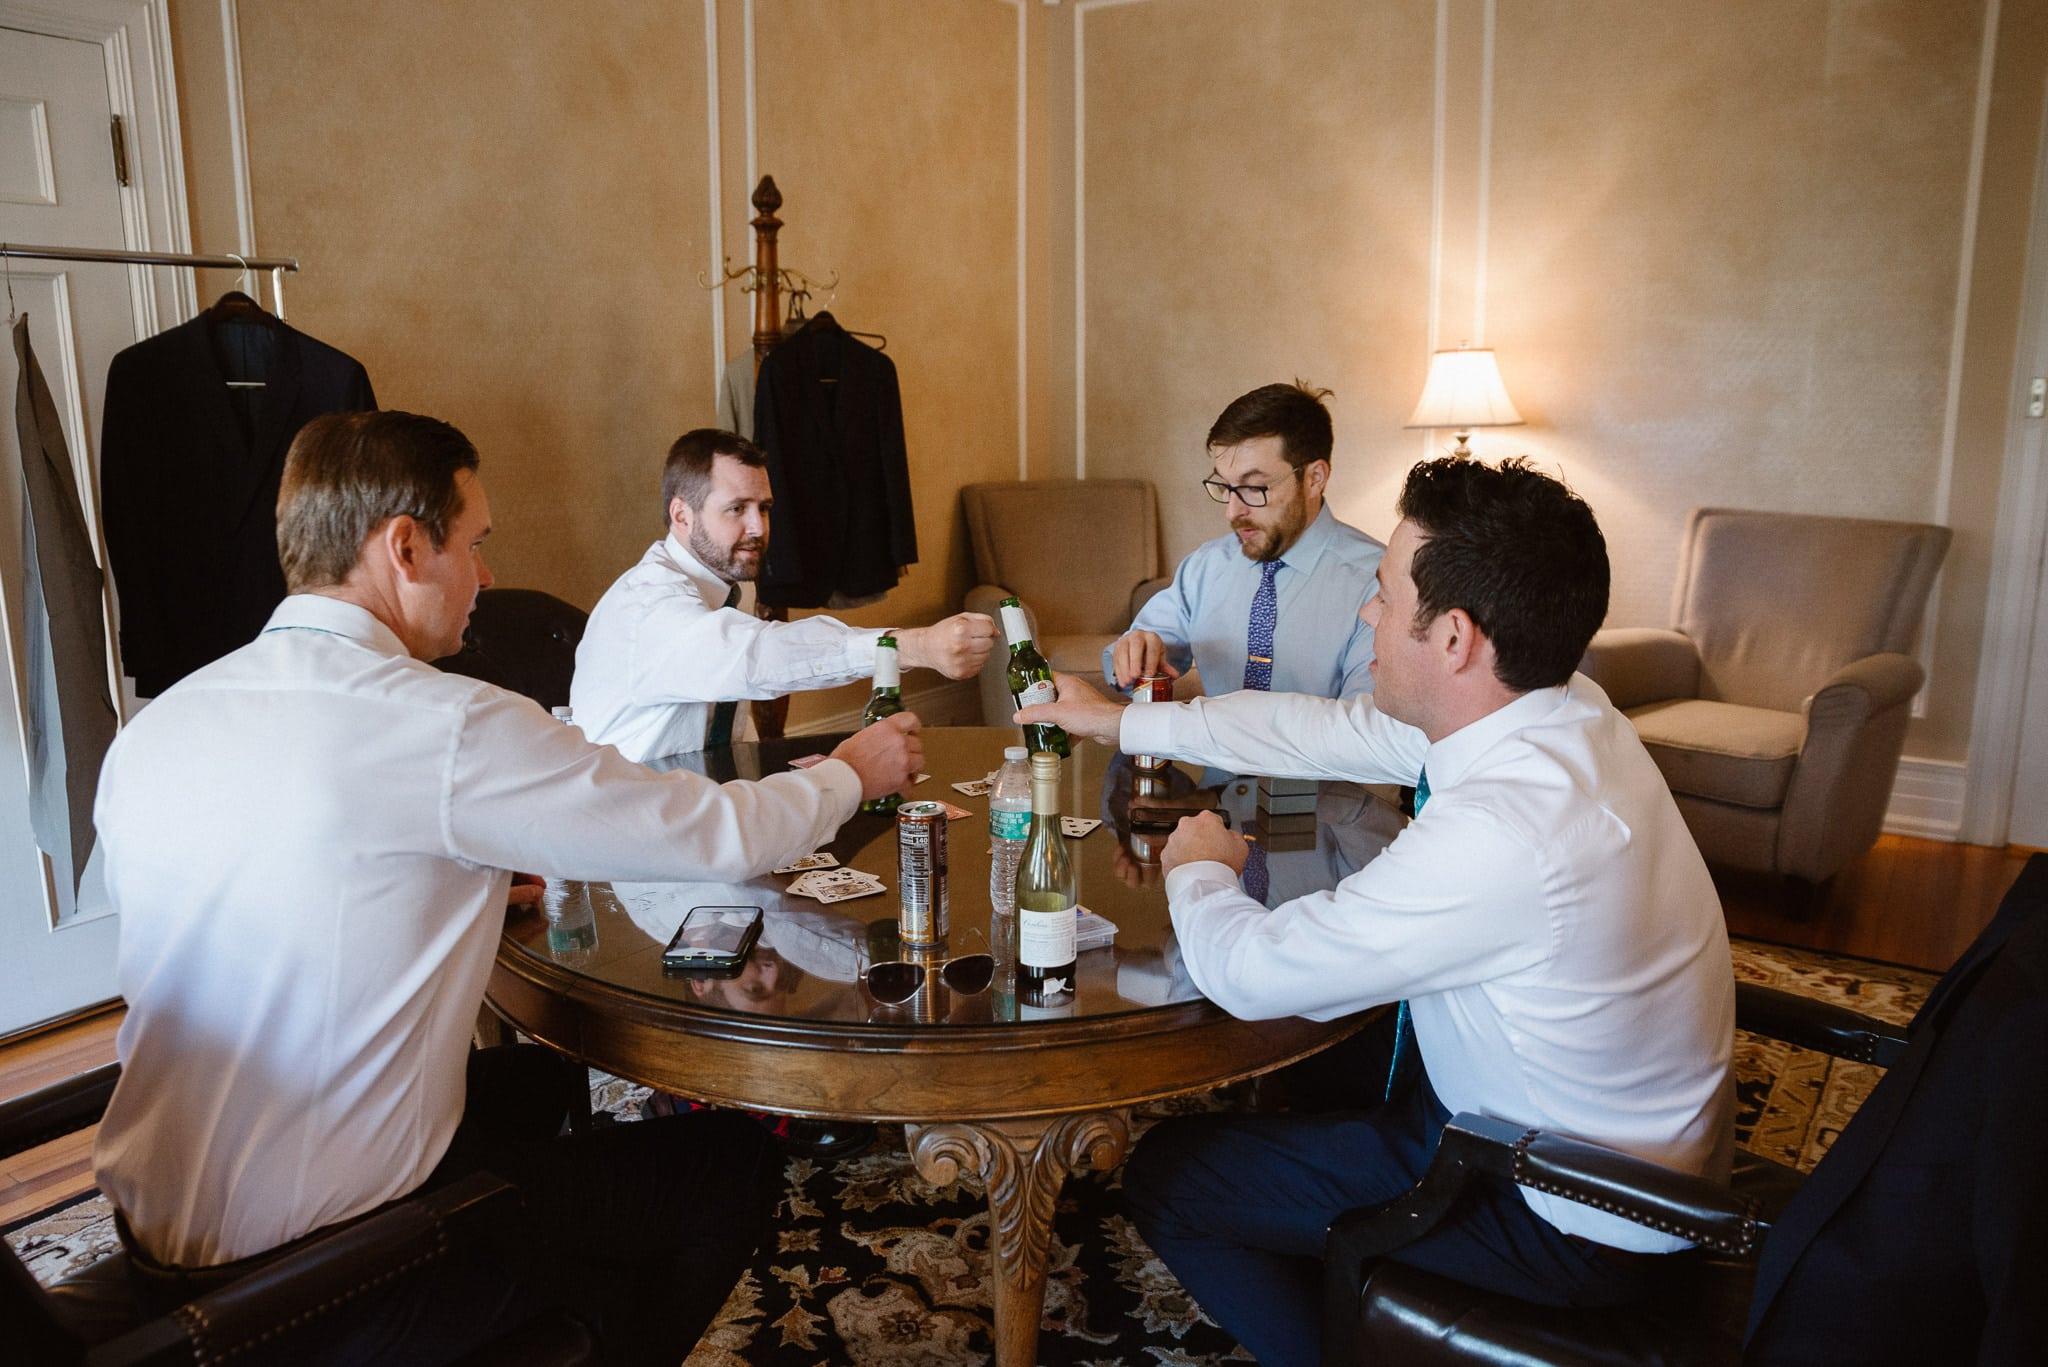 Grant Humphreys Mansion Wedding Photographer, Denver wedding photographer, Colorado wedding photographer, groom getting ready